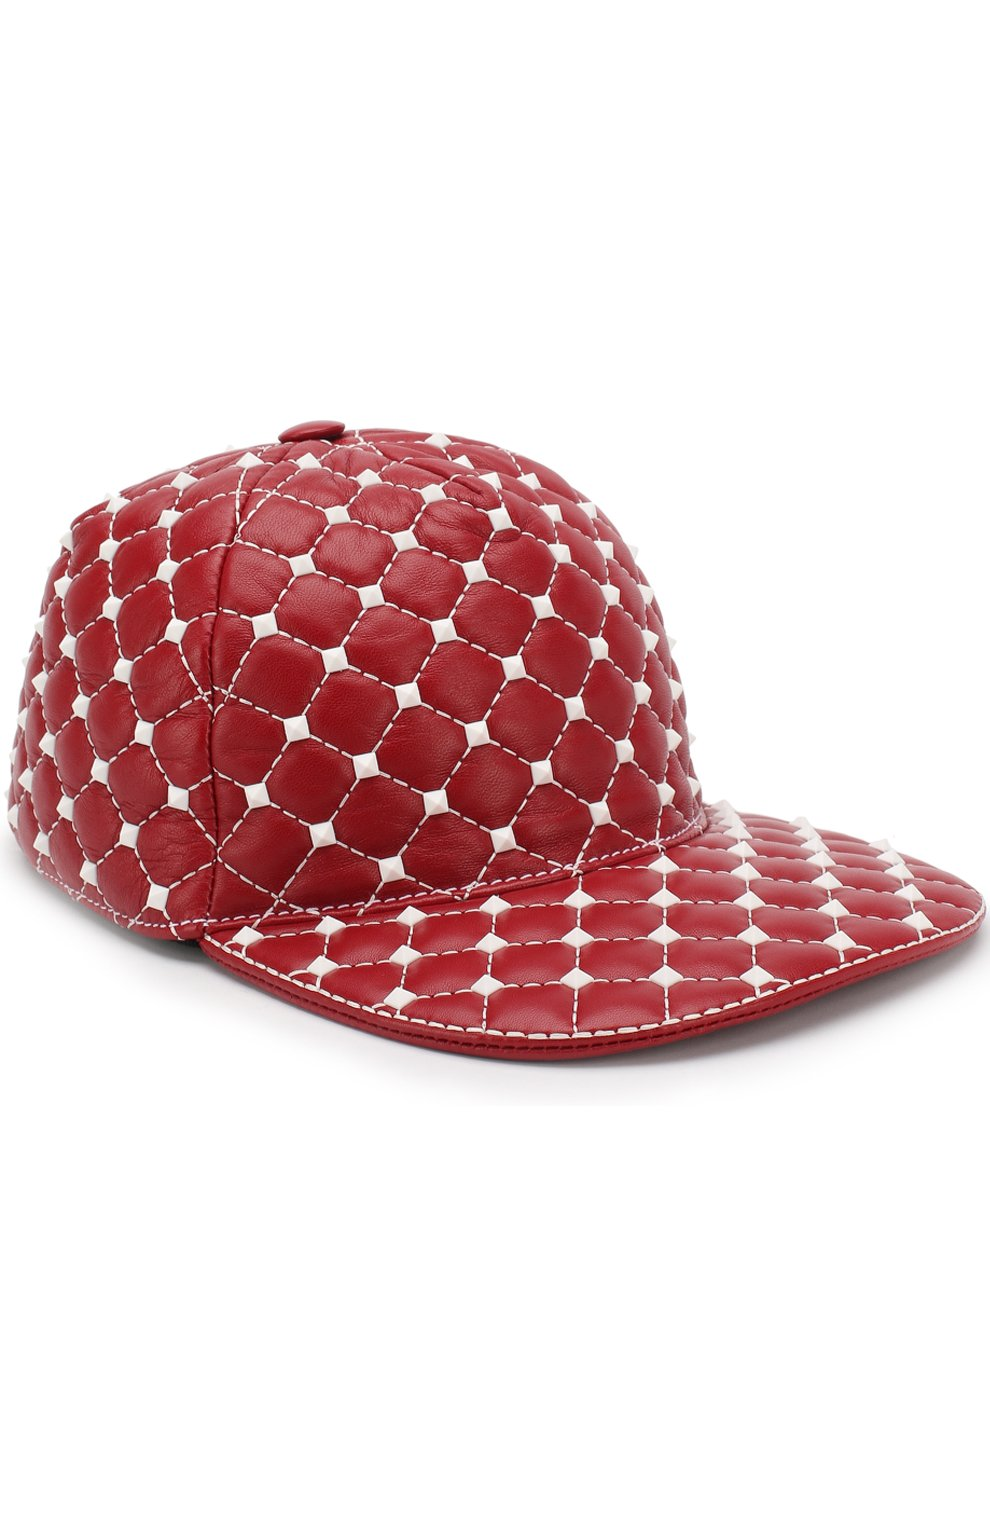 Кожаная кепка Valentino Garavani Rockstud Spike Free   Фото №1